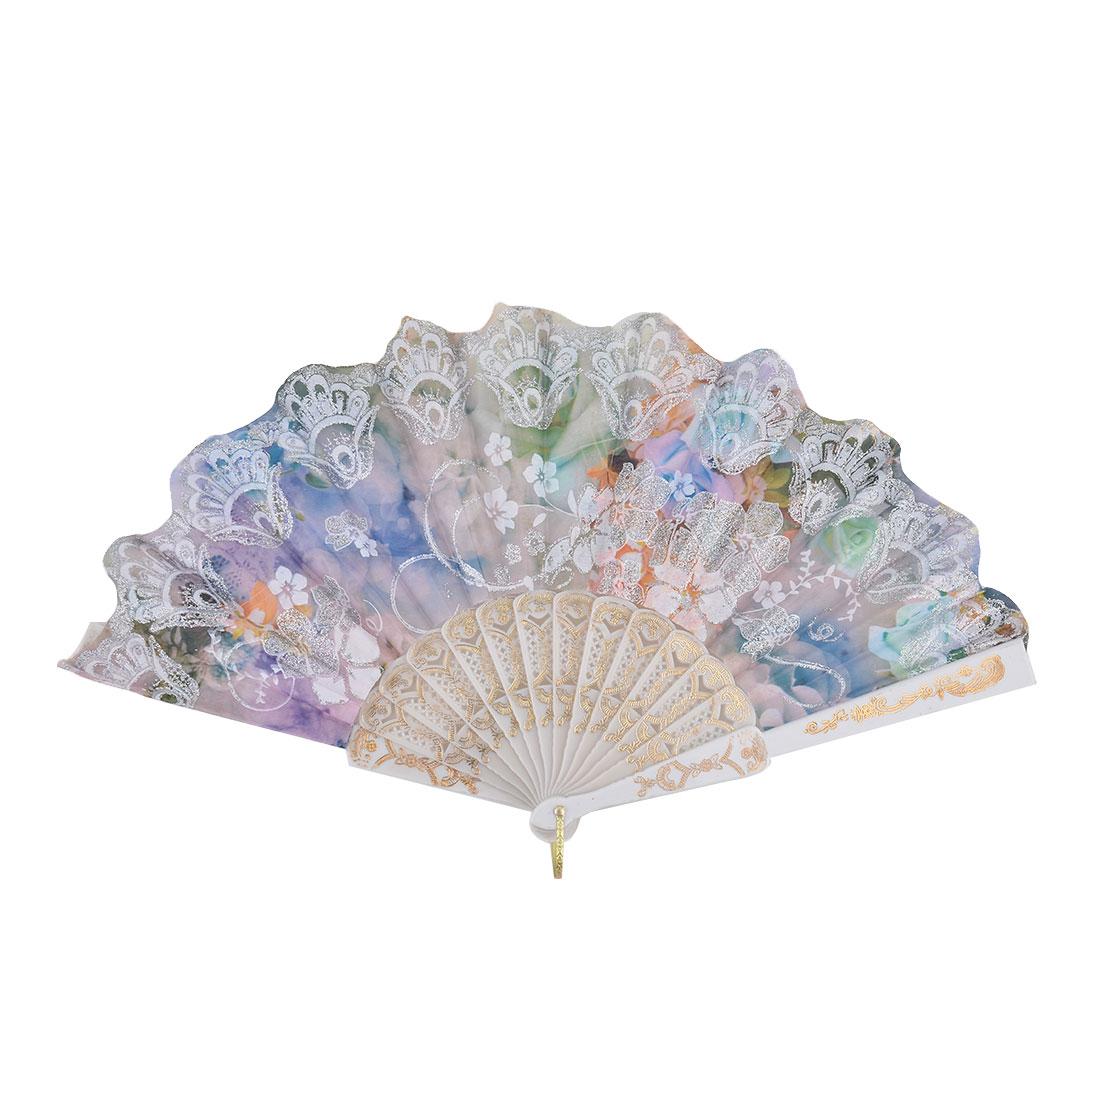 Lady Dancing Plastic Flower Pattern Powder Detail Exquisite Pocket Folding Fan